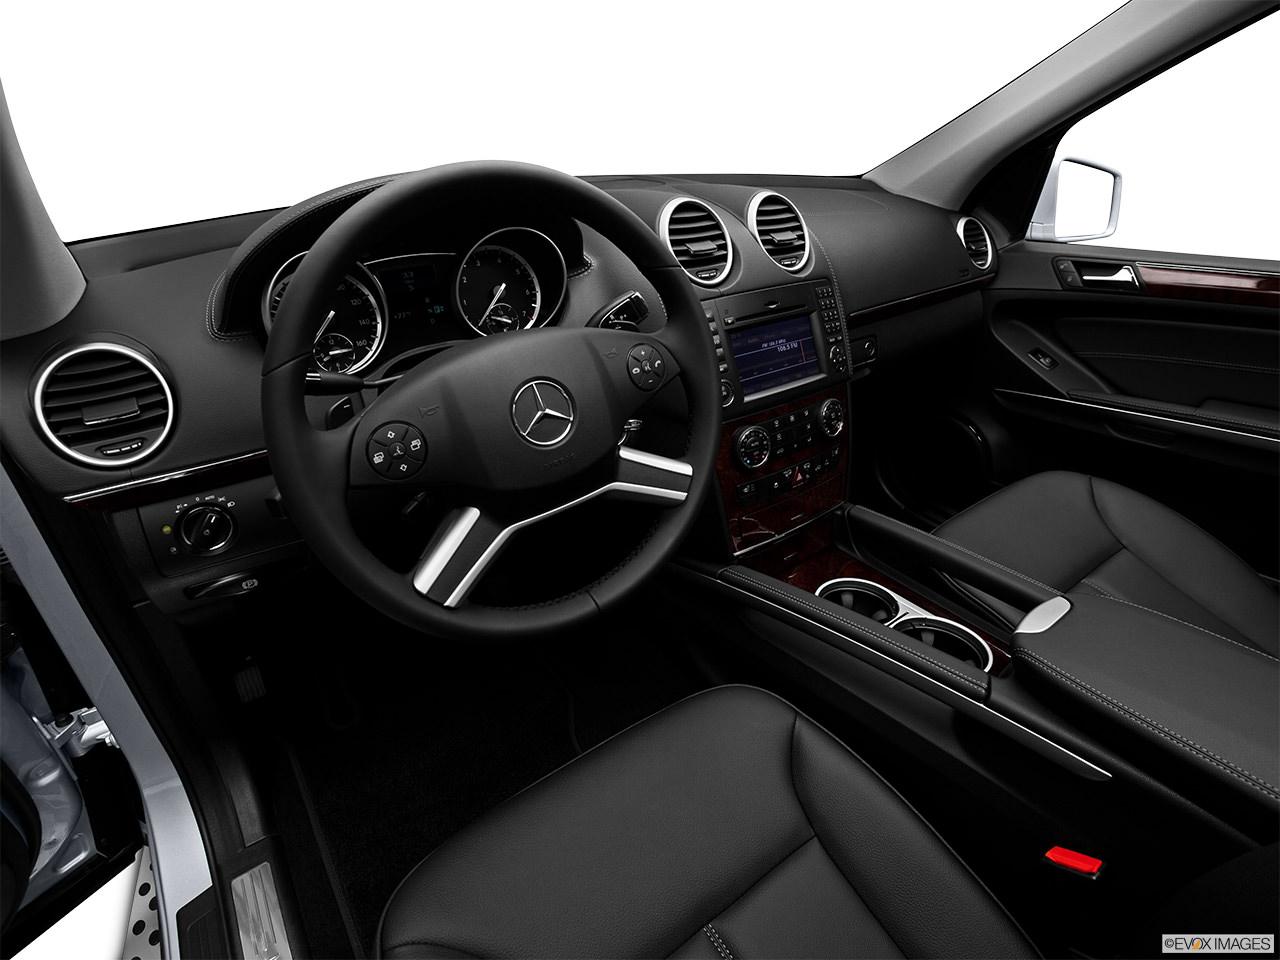 Mercedes Benz GL Class 2012 Interior